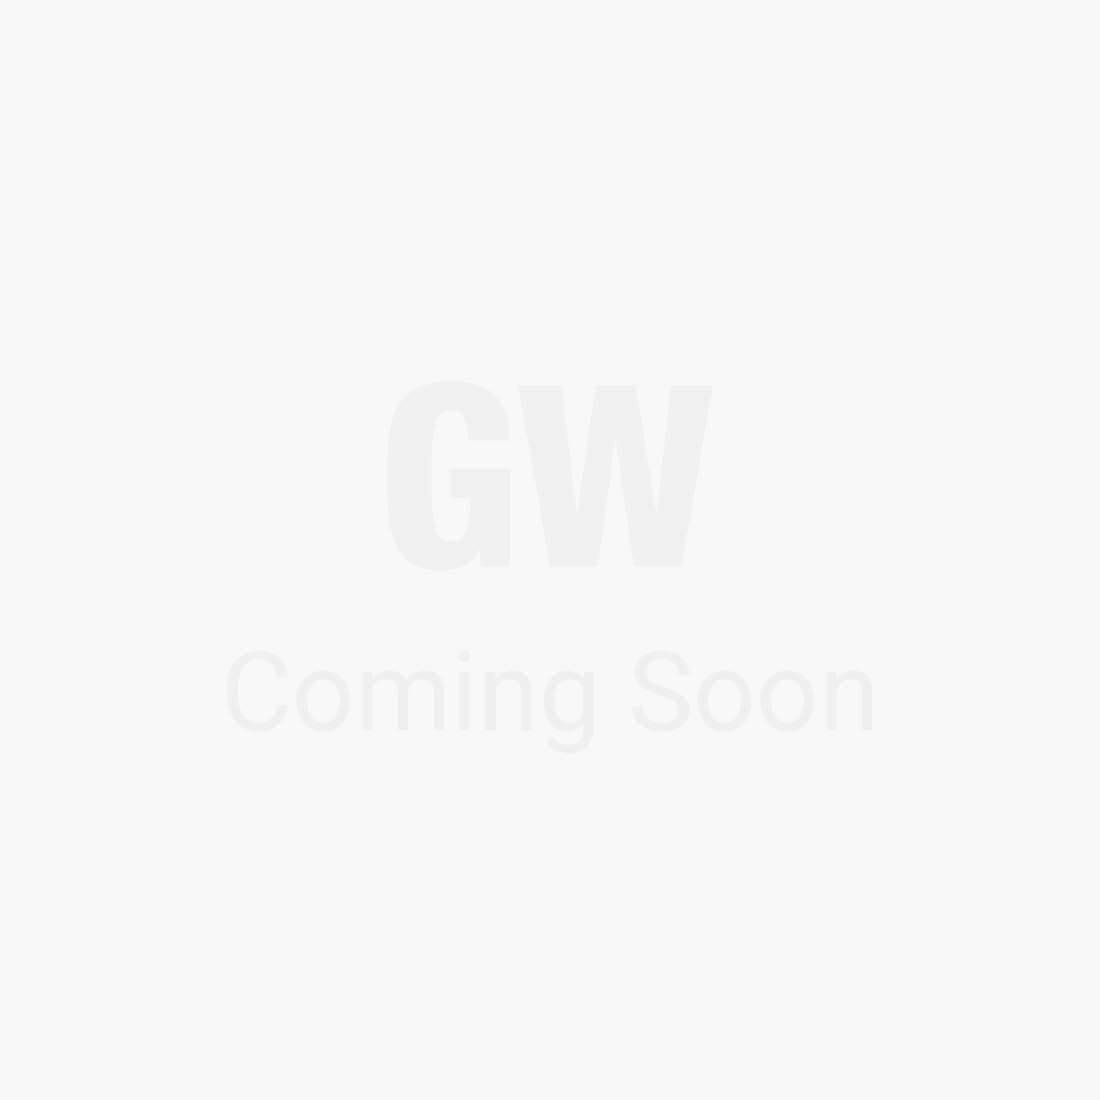 Marina Sleigh Occasional Chair